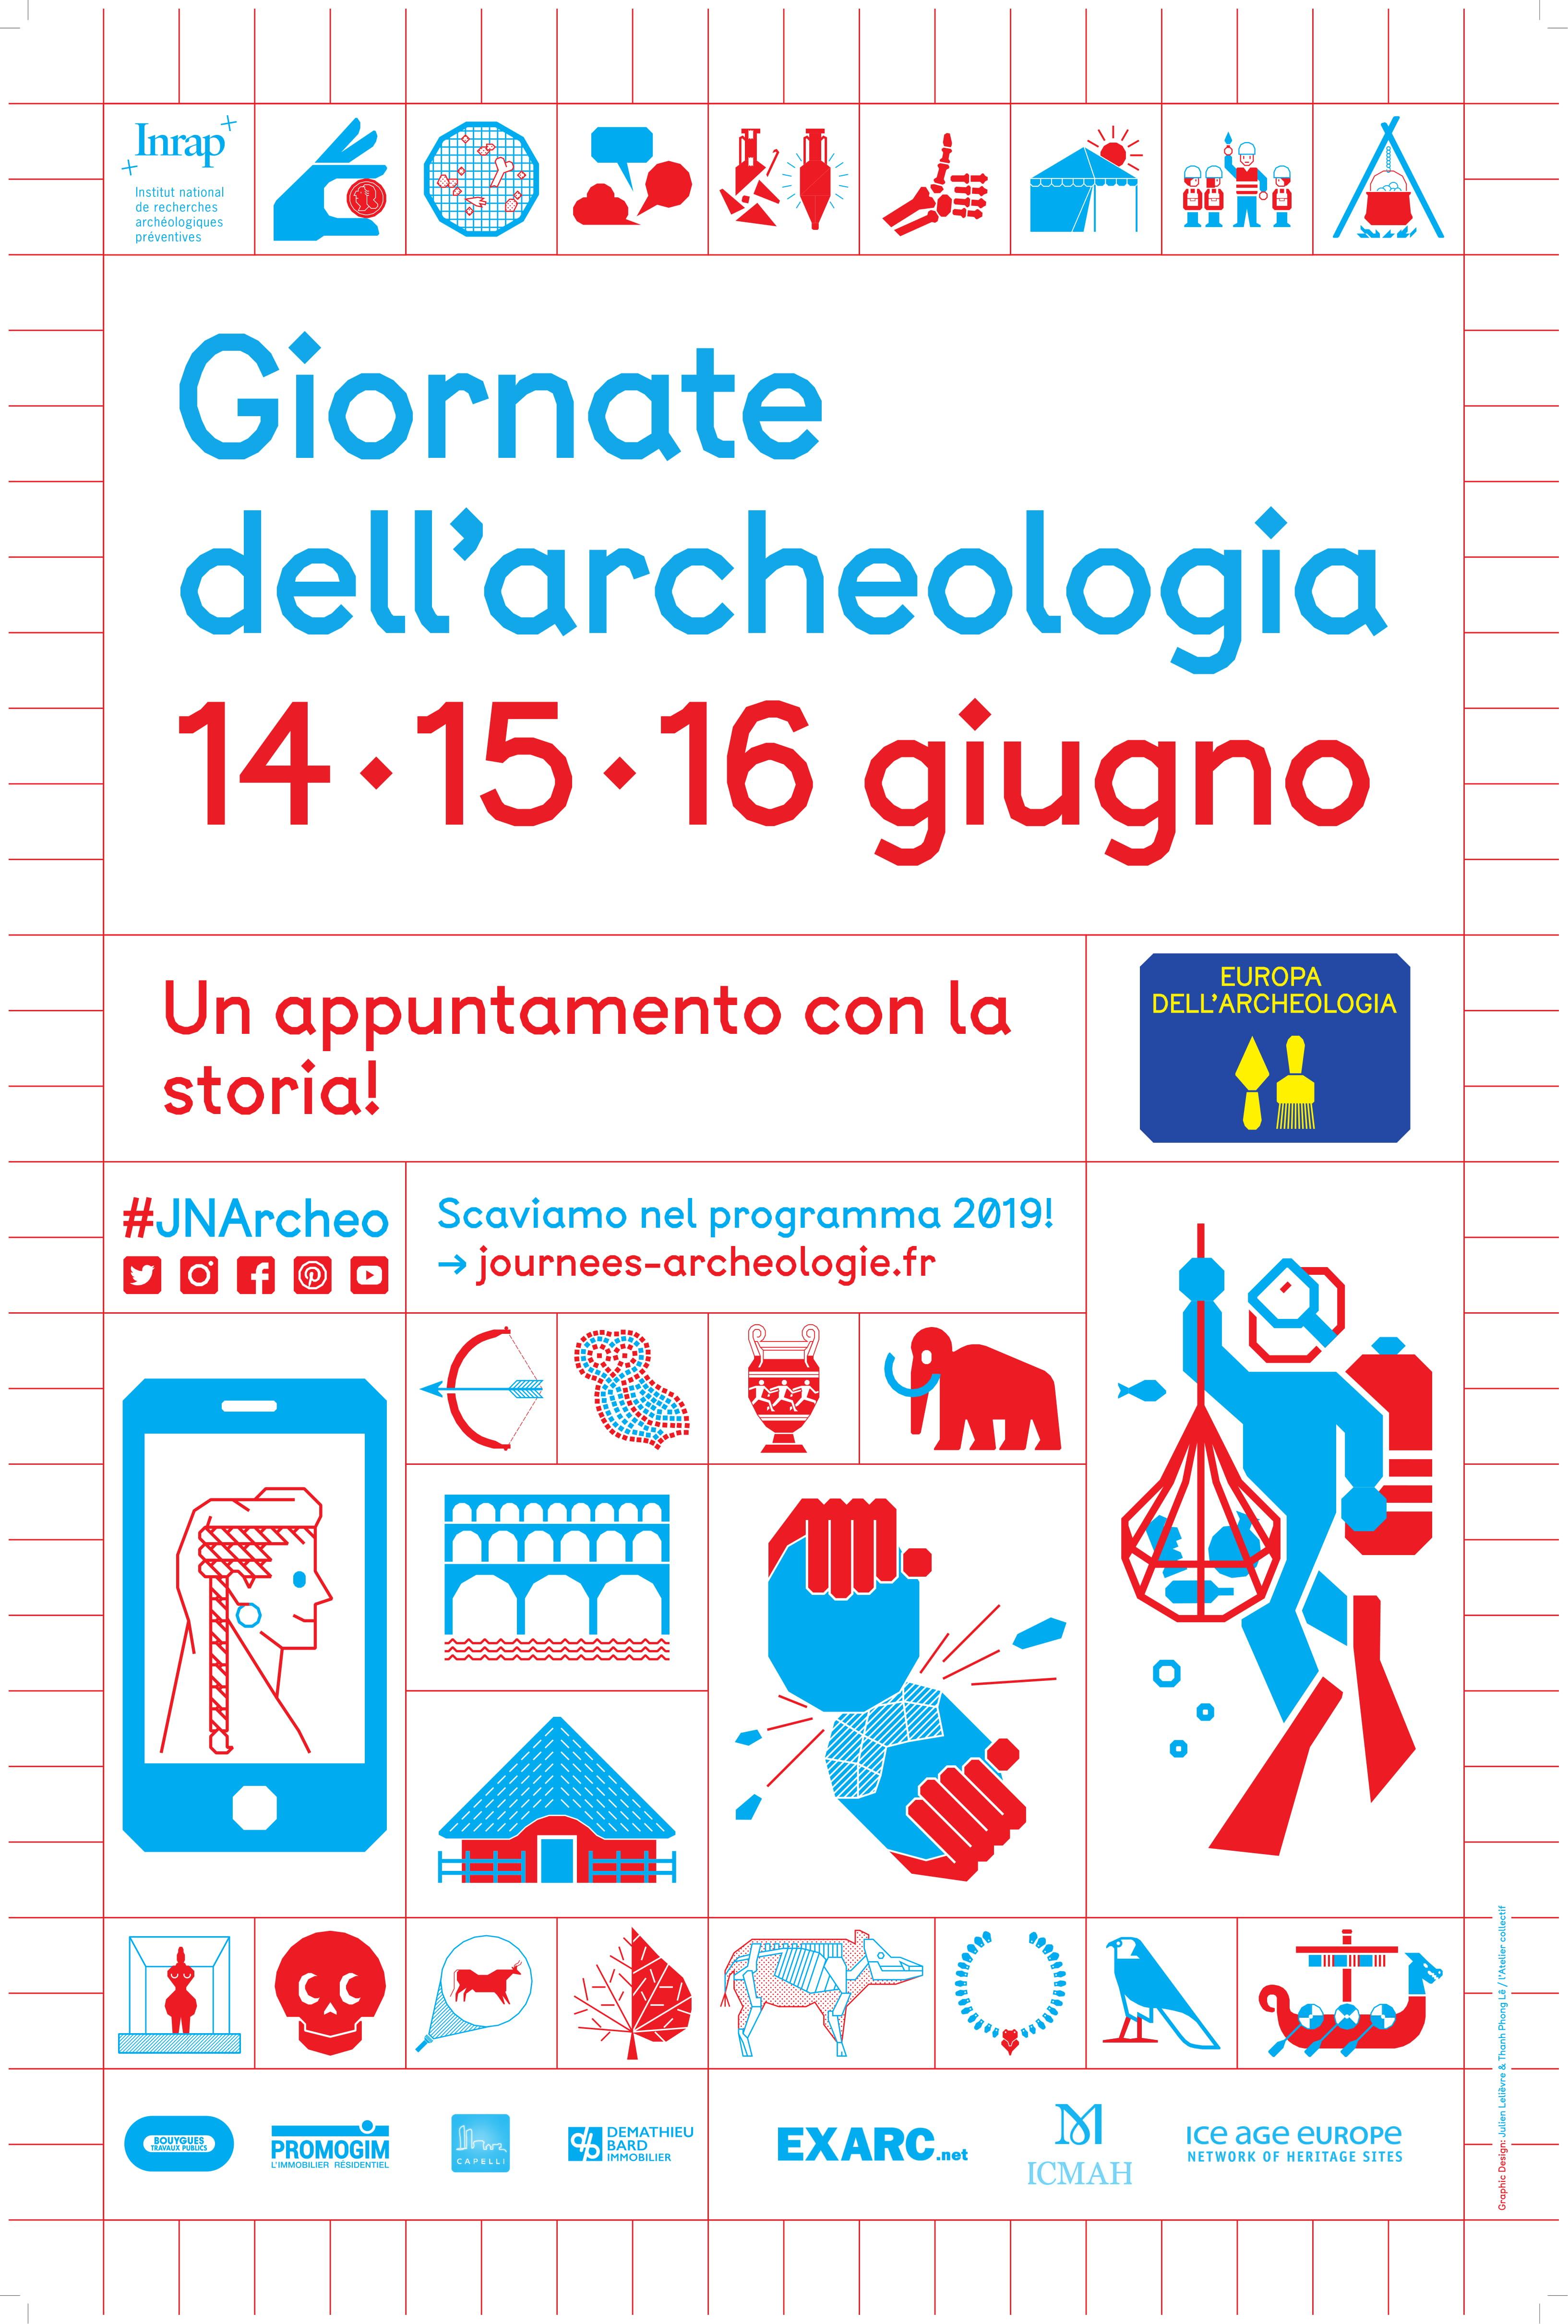 giornatearcheologia_giu19-1